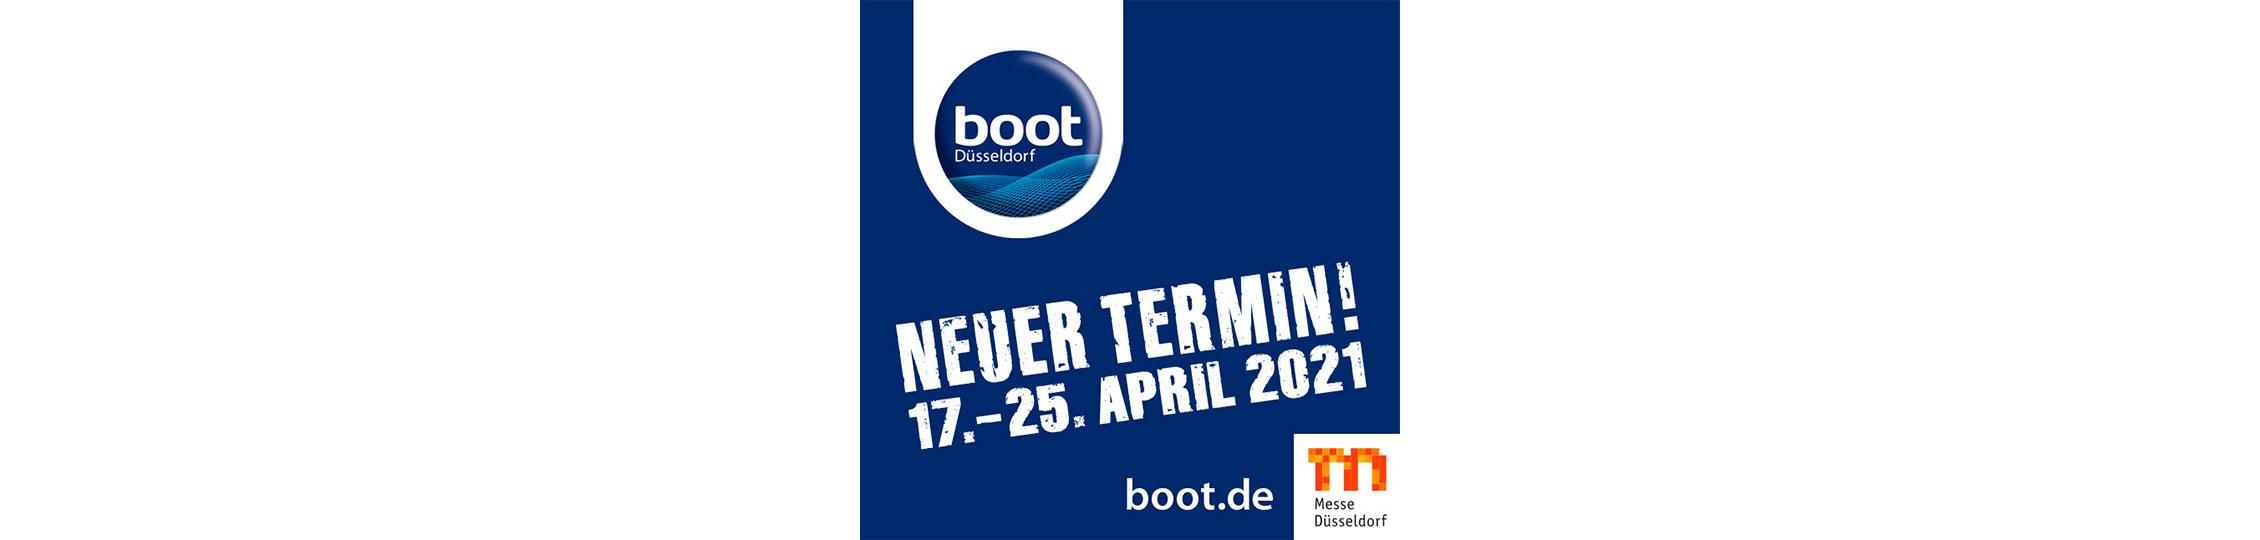 boot neuer Termin